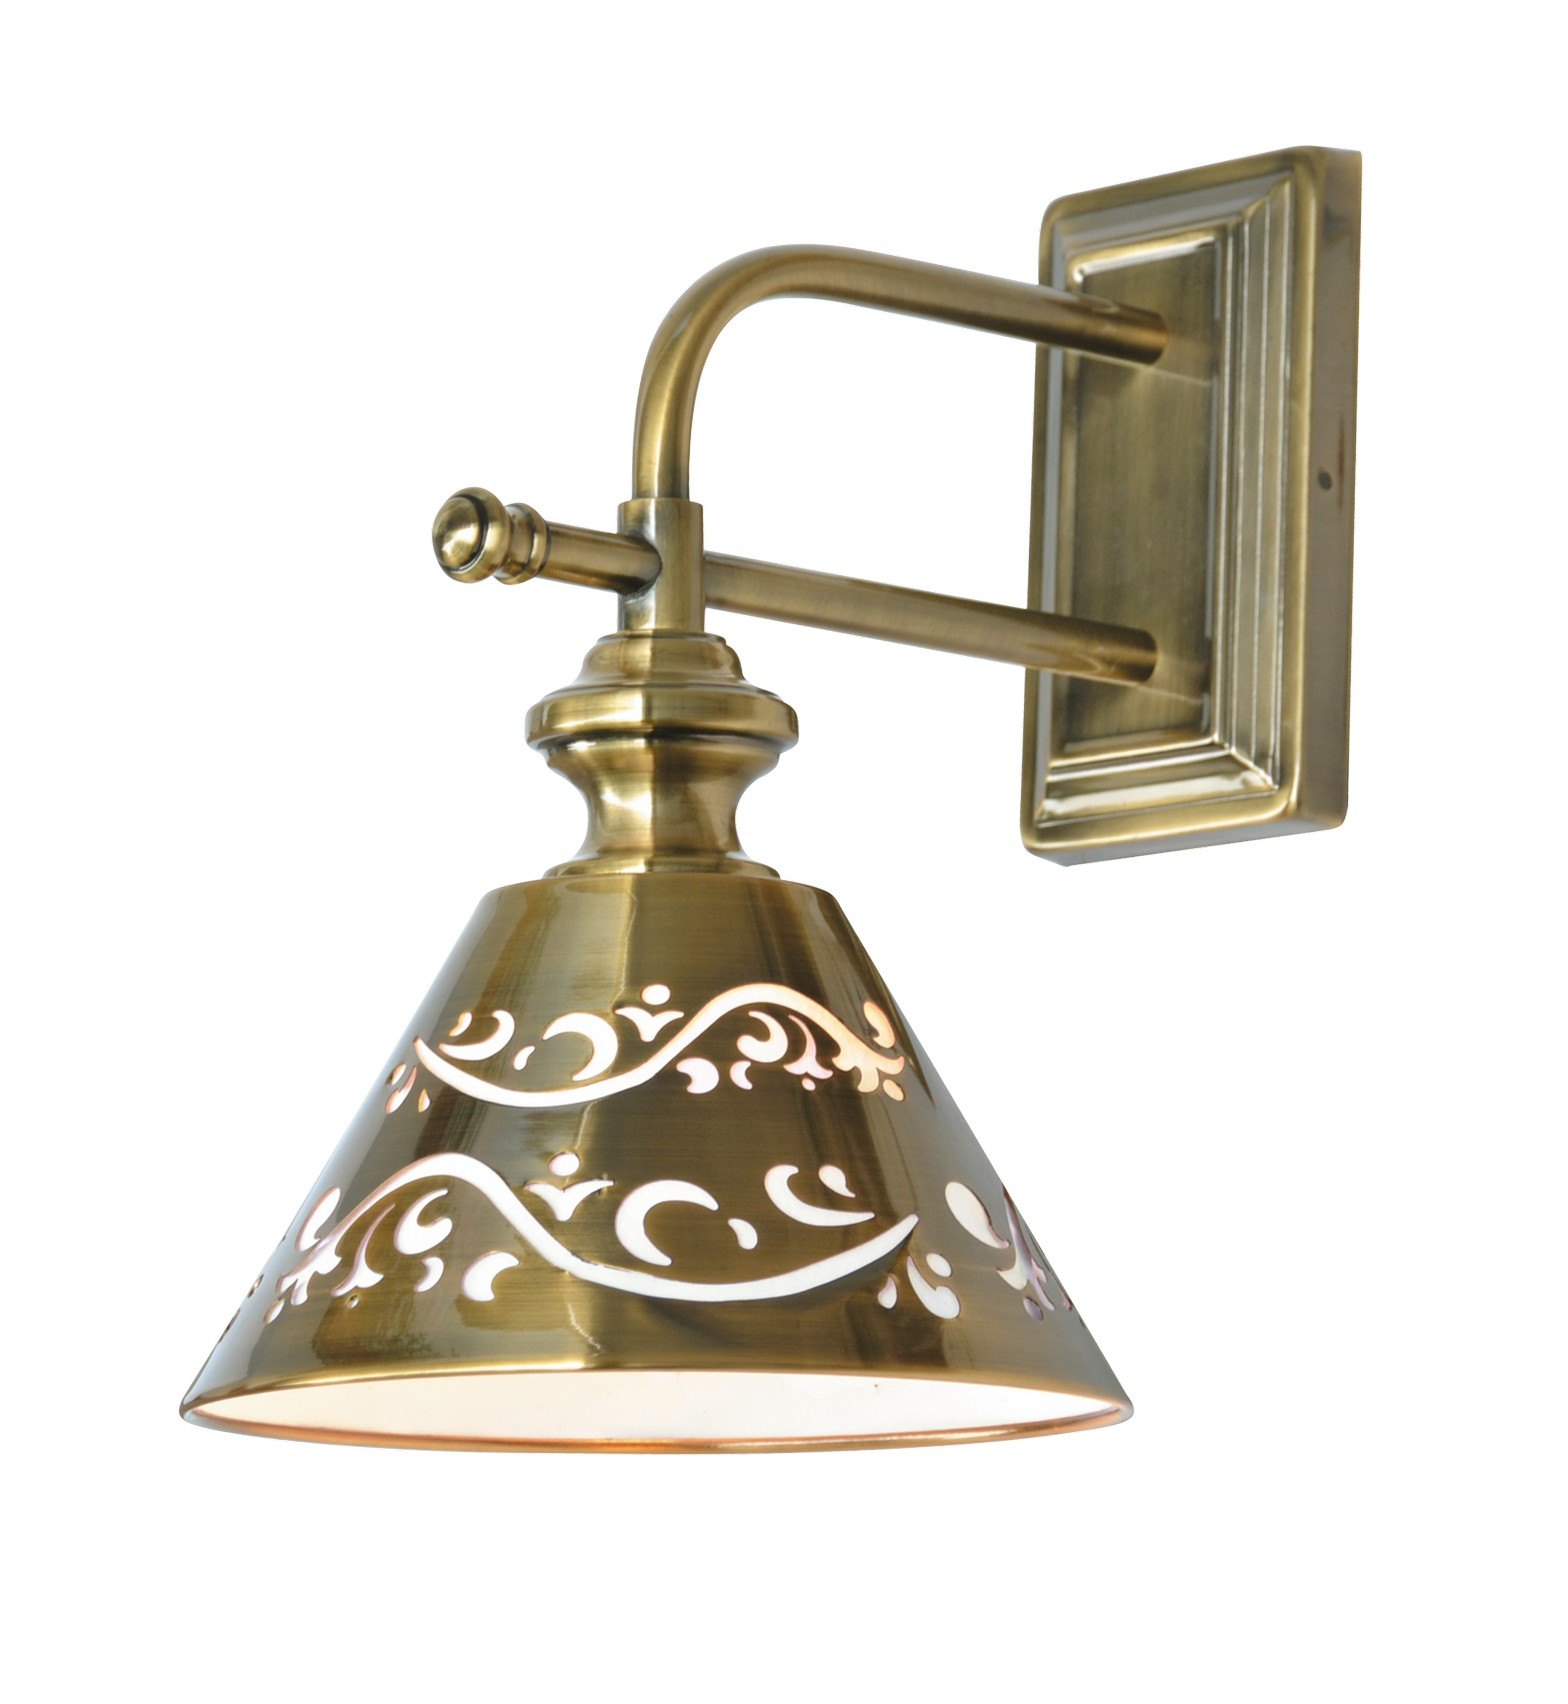 Бра Arte lamp Kensington a1511ap-1pb бра arte lamp kensington a1511ap 1wg